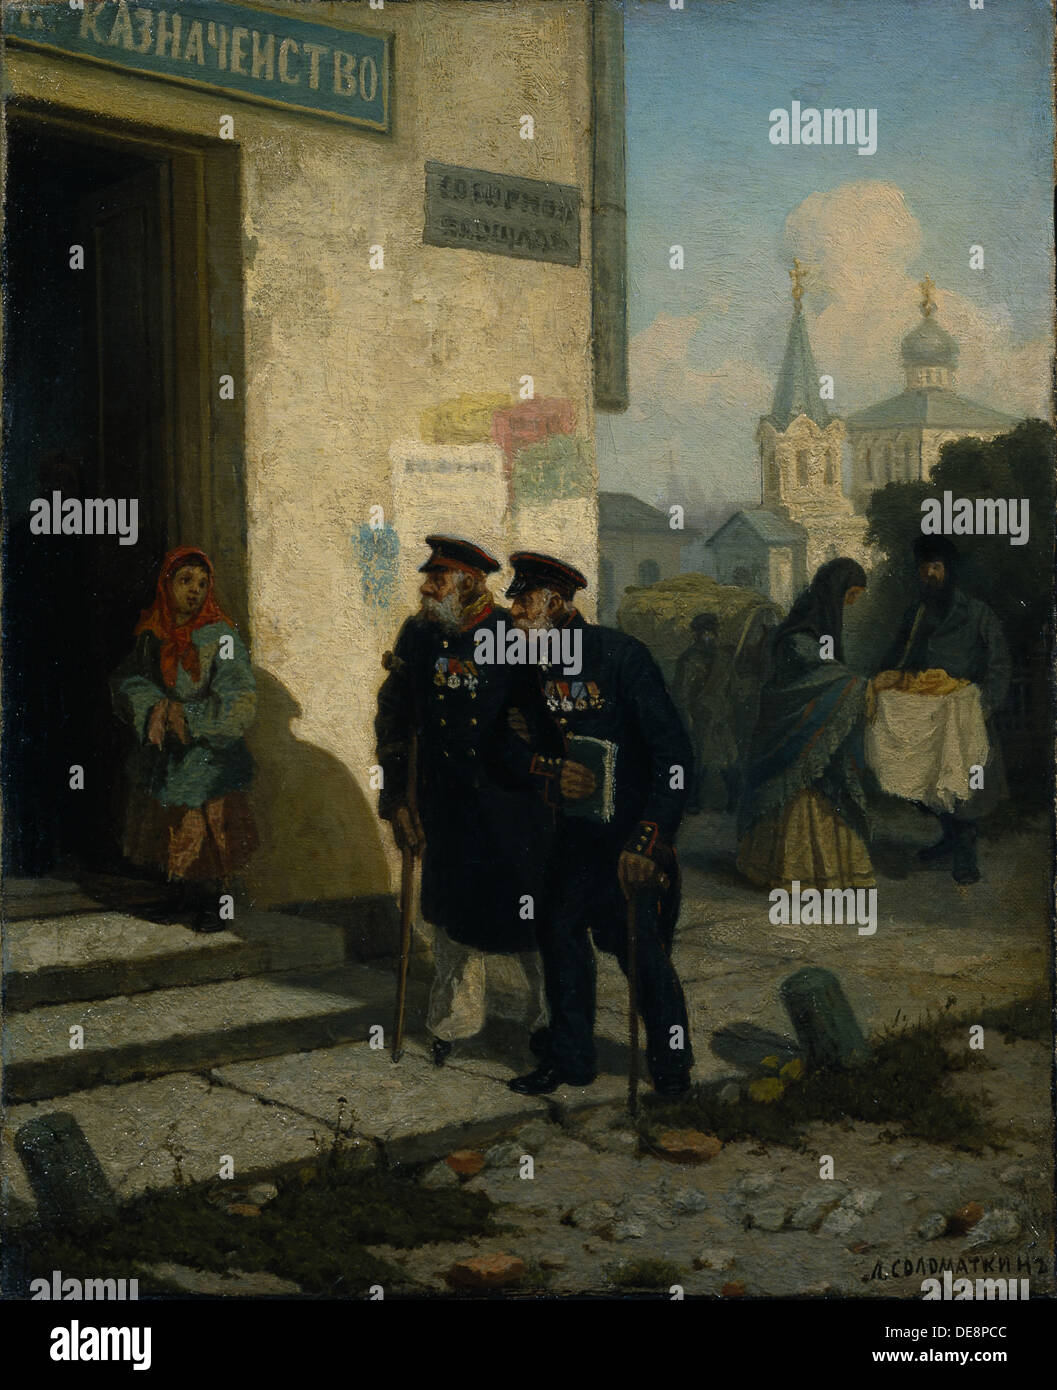 The Pension Day, 1878. Artist: Solomatkin, Leonid Ivanovich (1837-1883) - Stock Image